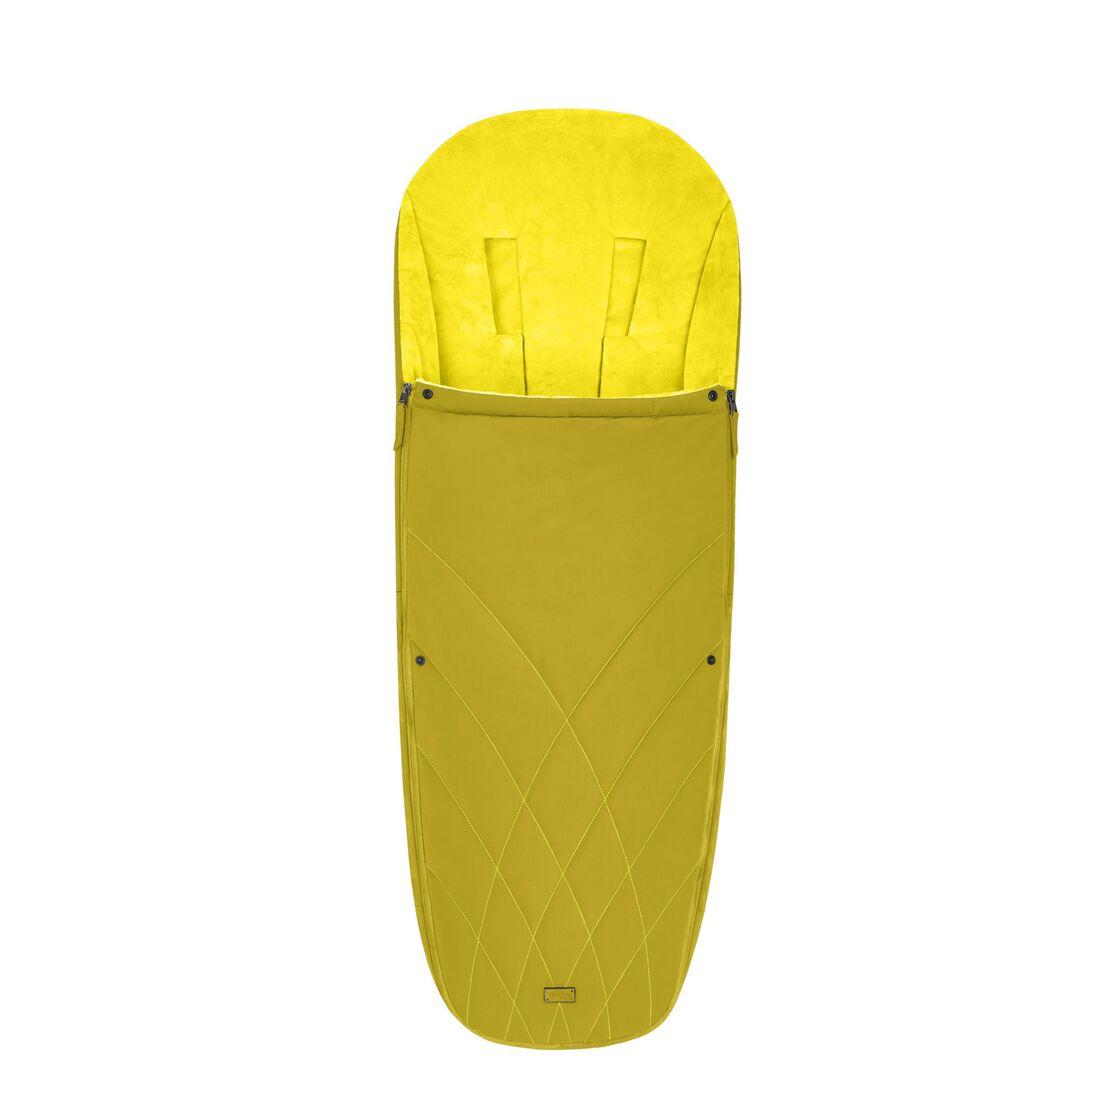 CYBEX Platinum Footmuff - Mustard Yellow in Mustard Yellow large image number 1